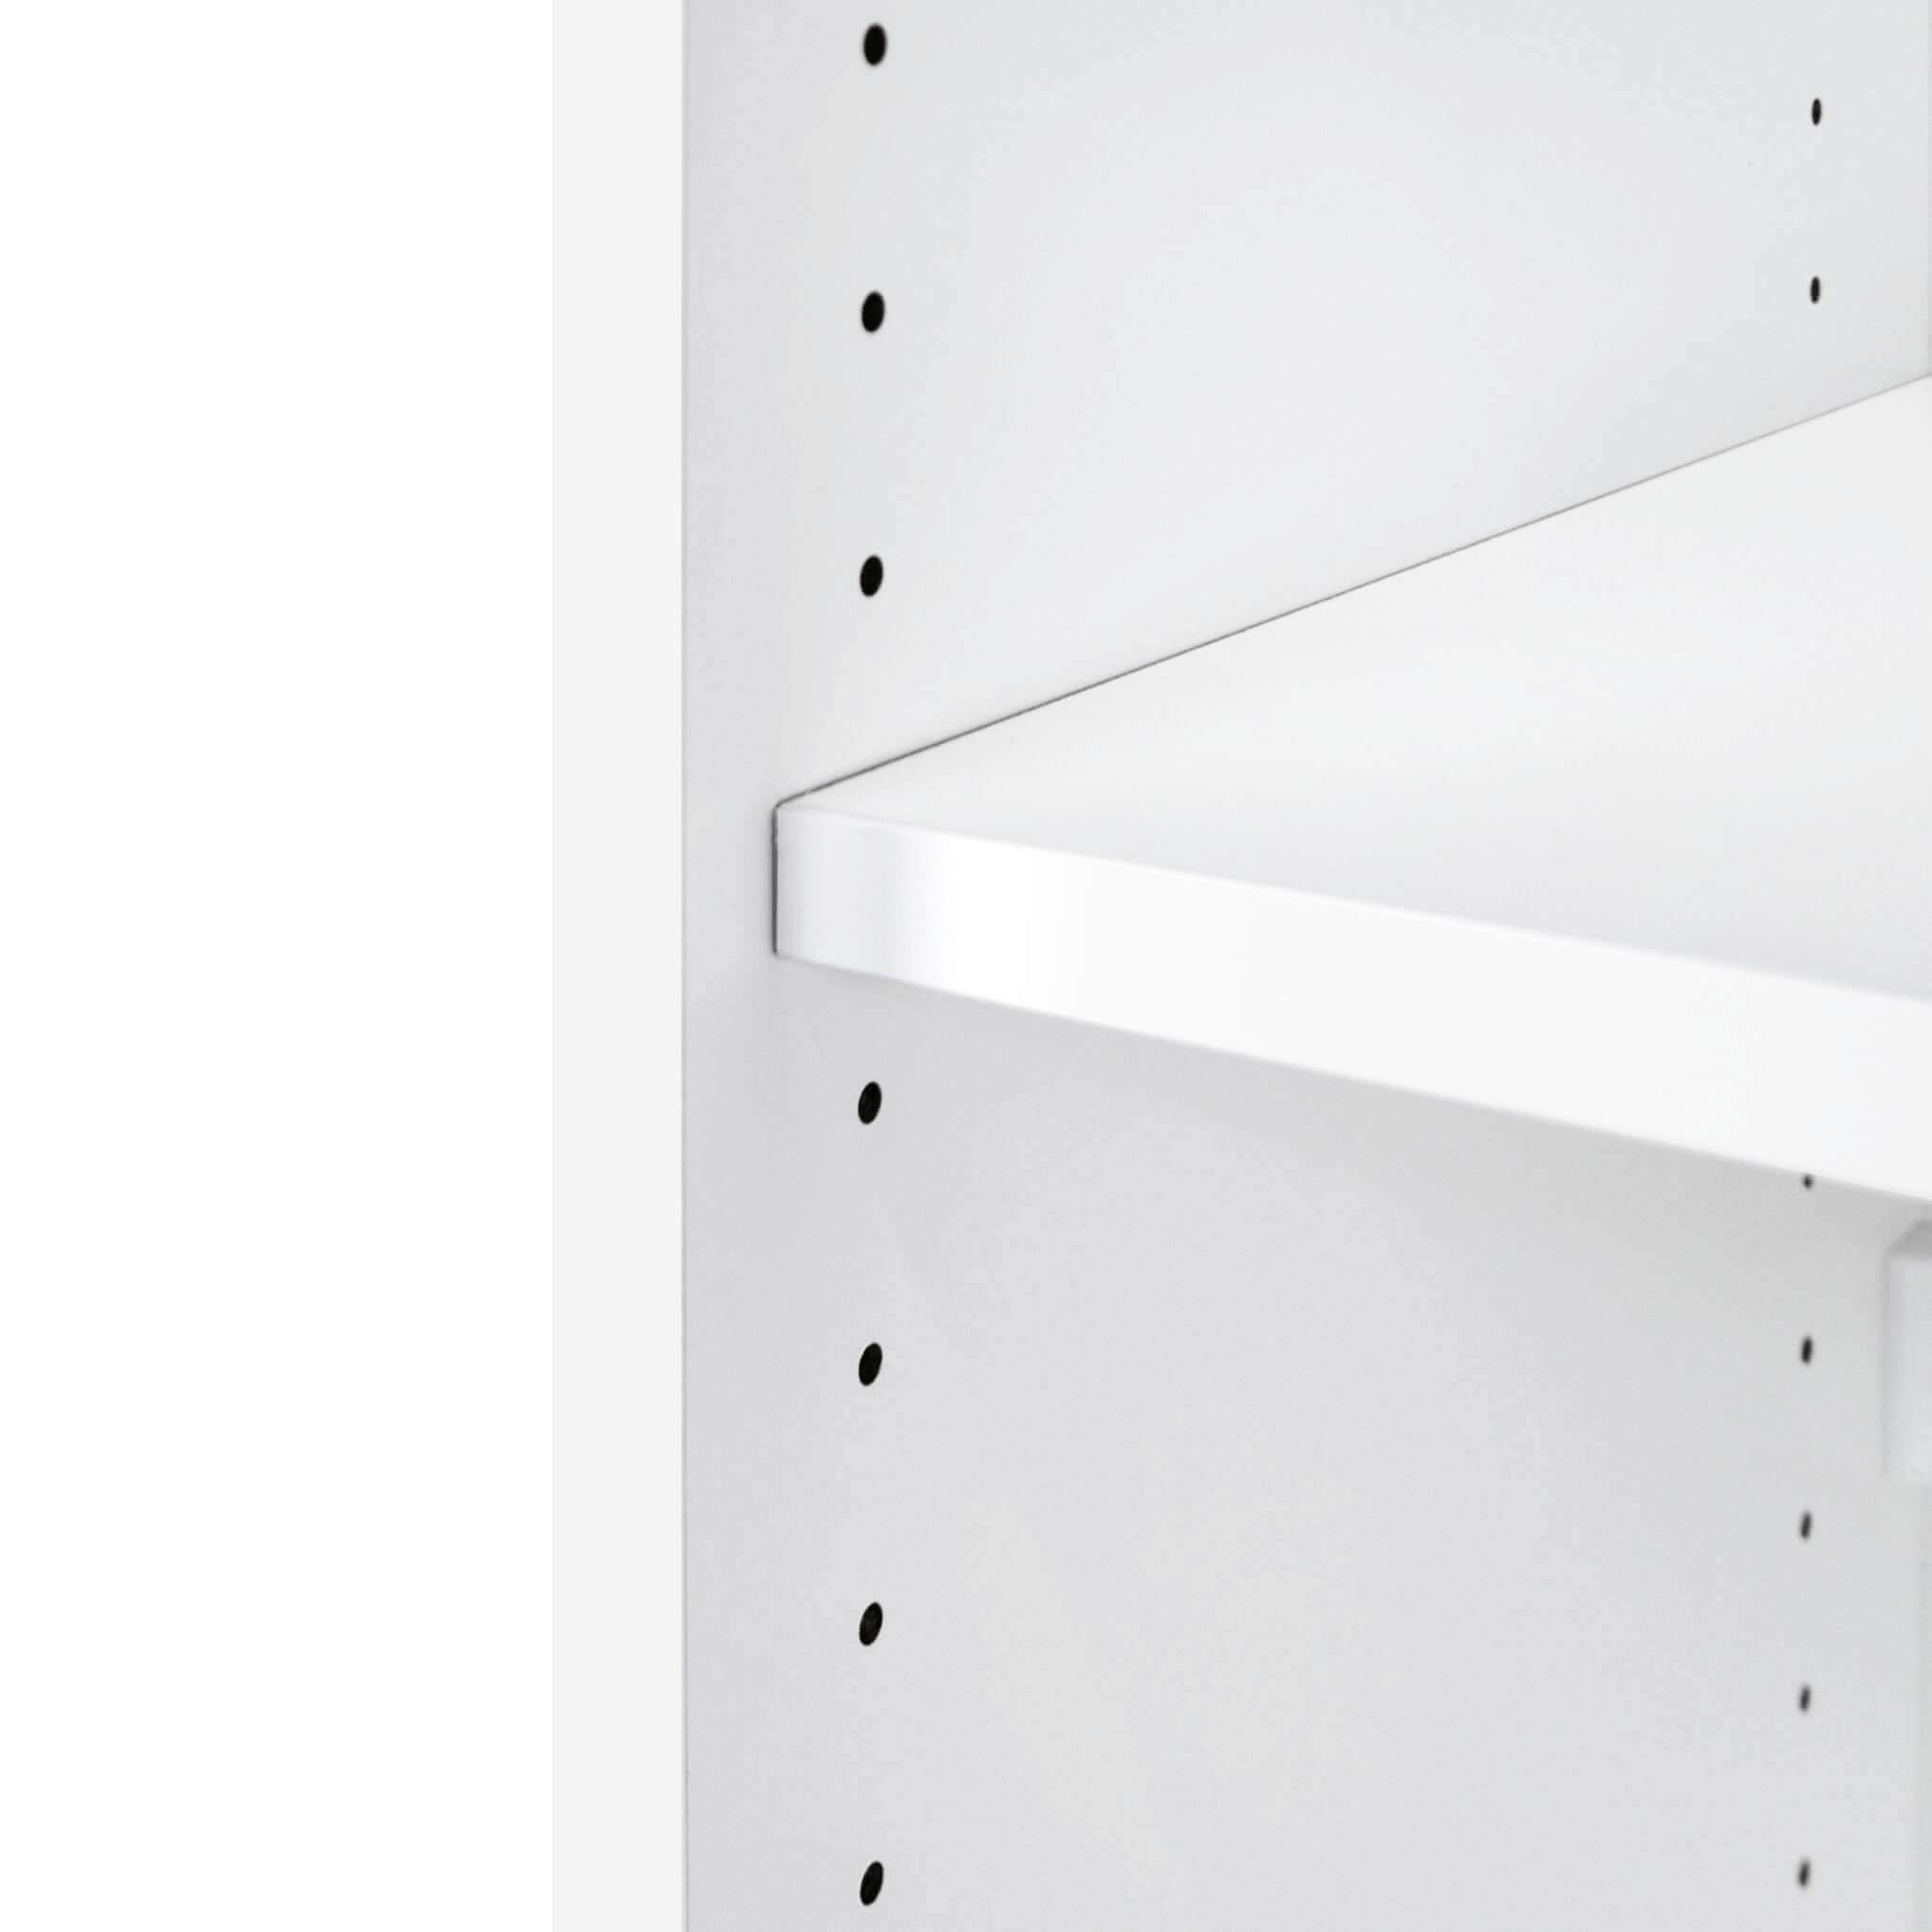 UNI Aktenschrank abschließbar 3OH 1,0 M Weiß Büroschrank Schiebetürenschrank